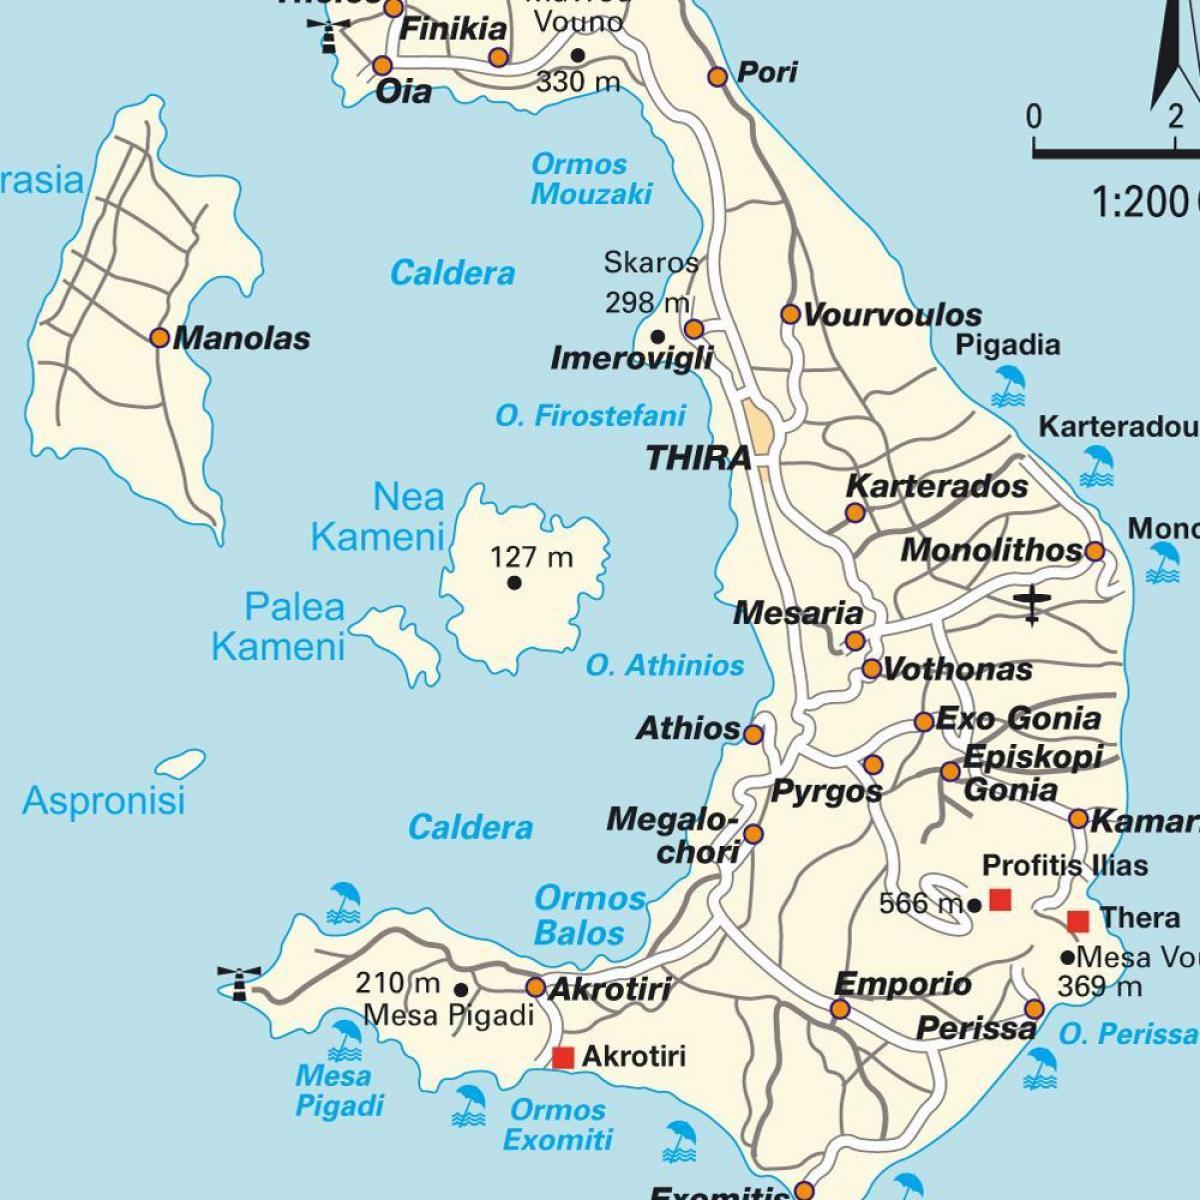 Santorini Kort Graekenland Santorini Graekenland Det Sydlige